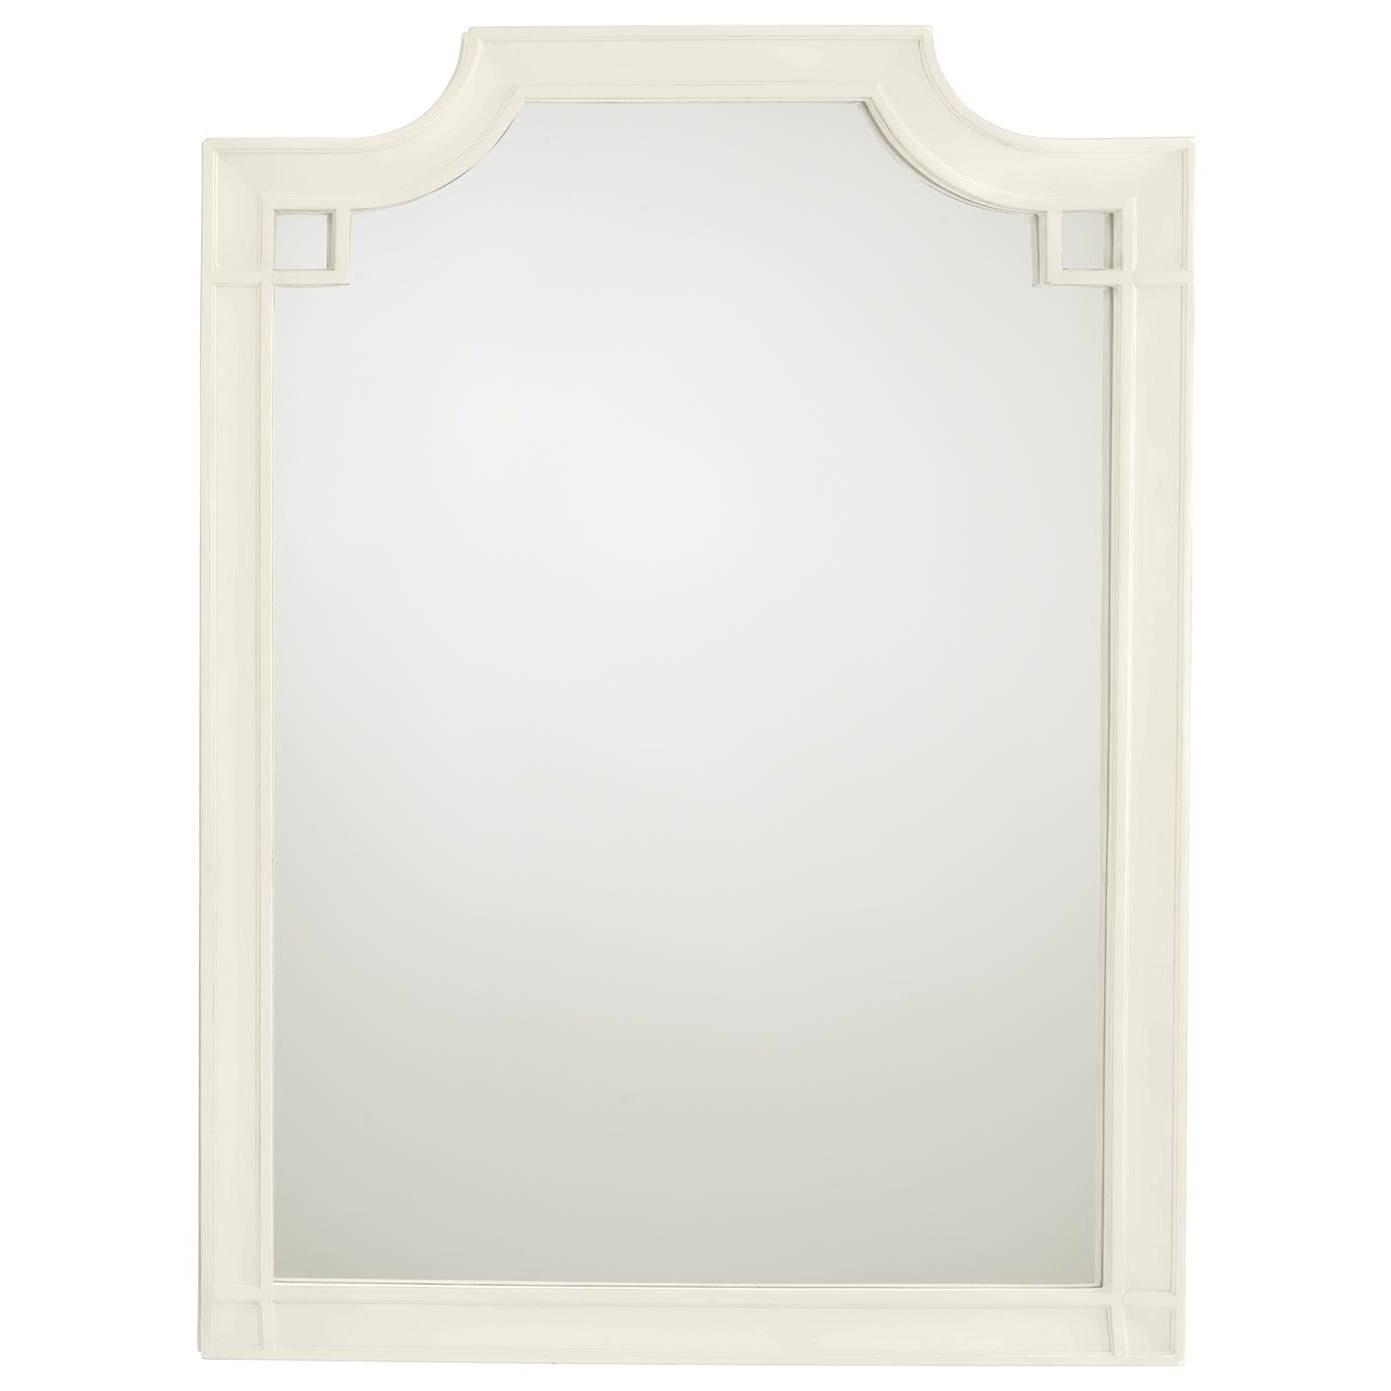 Stanley Furniture Coastal Living Oasis Silver Lake Vertical Mirror - Item Number: 527-23-30